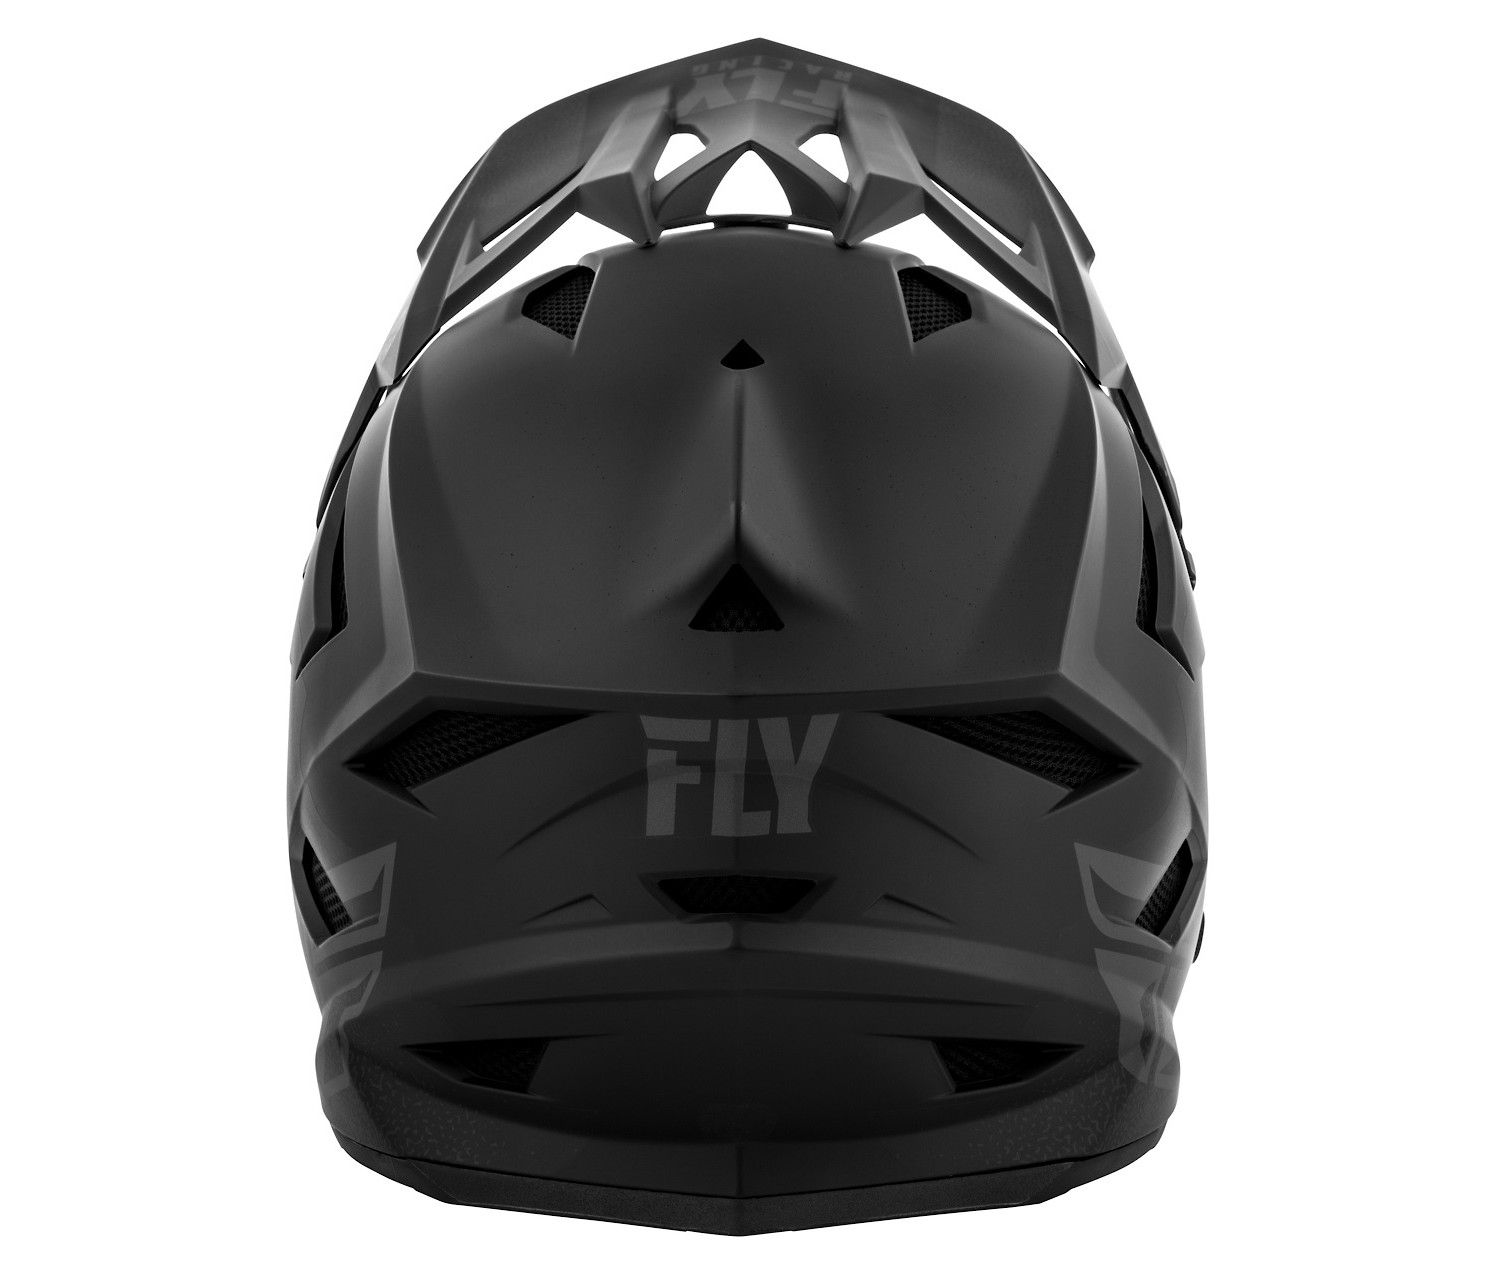 abb54ccdd84 Fly Racing Default Full Face Helmet - Reviews, Comparisons, Specs ...